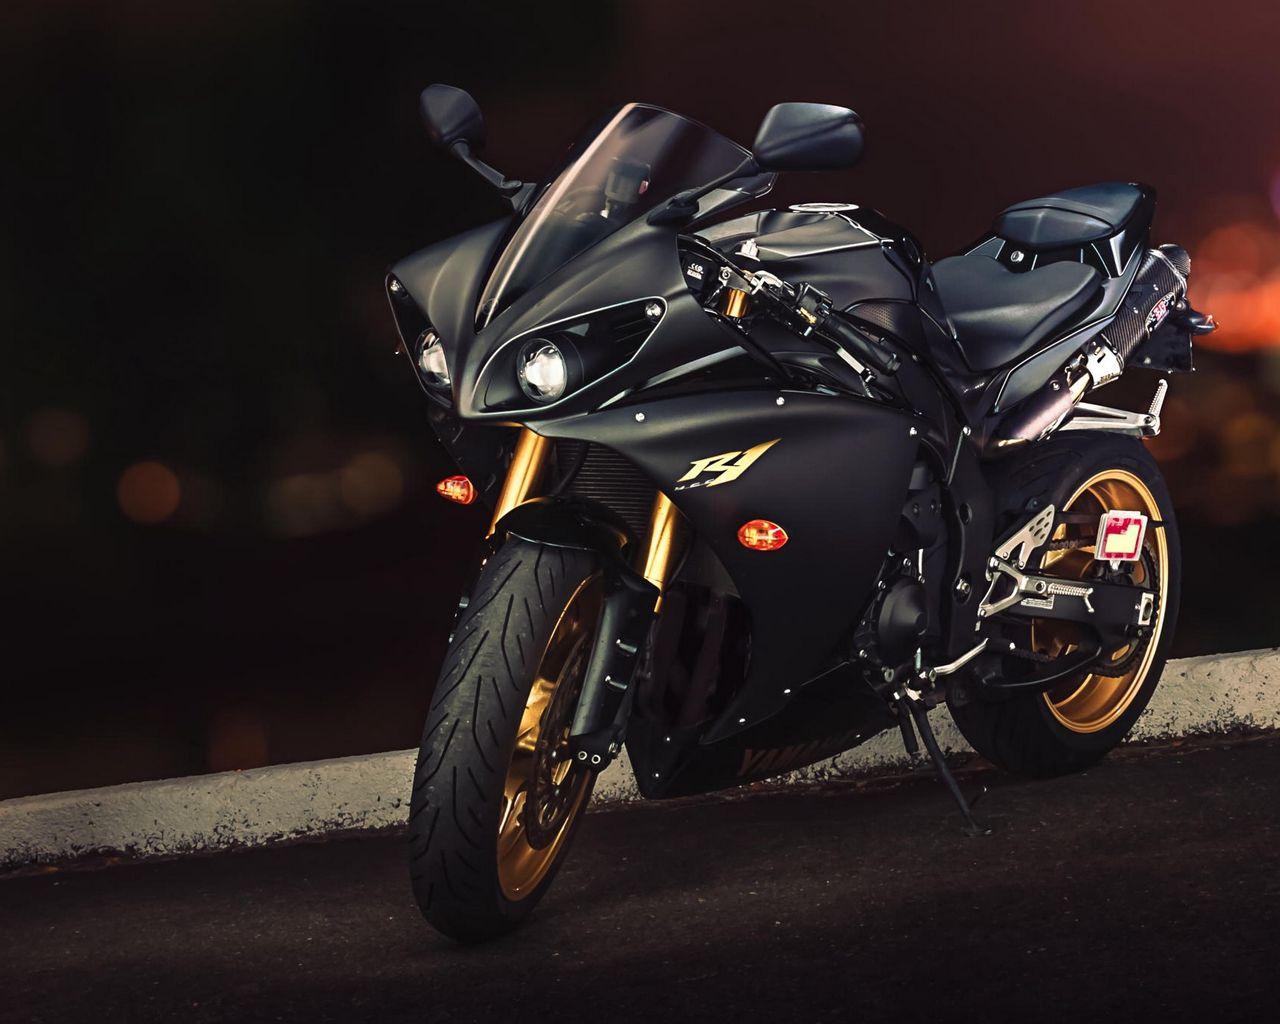 1280x1024 Wallpaper yamaha, yzf-r1, sport bike